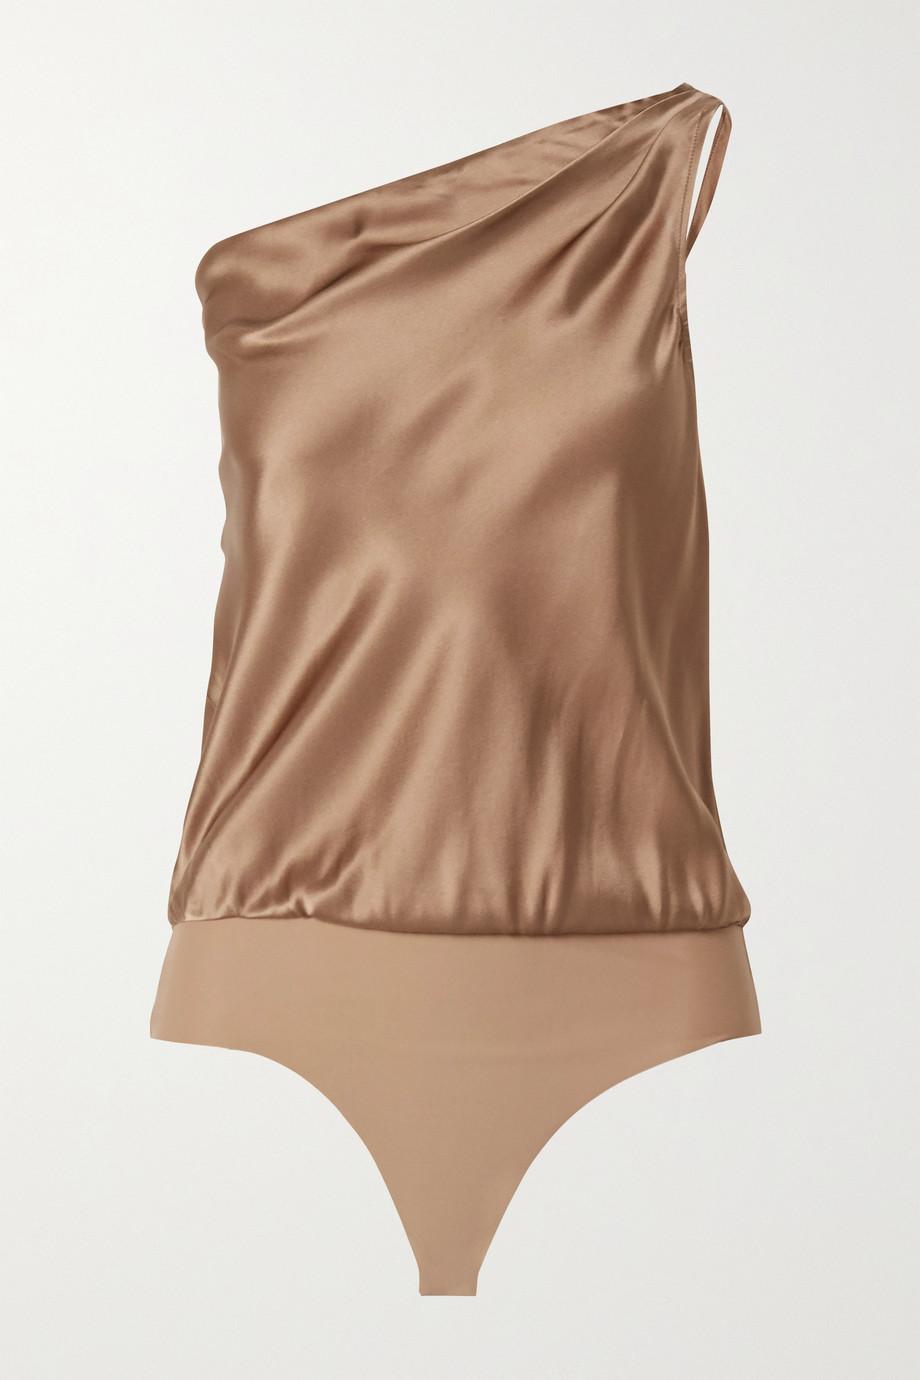 Cami NYC Body string asymétrique en charmeuse de soie et en jersey stretch The Darby